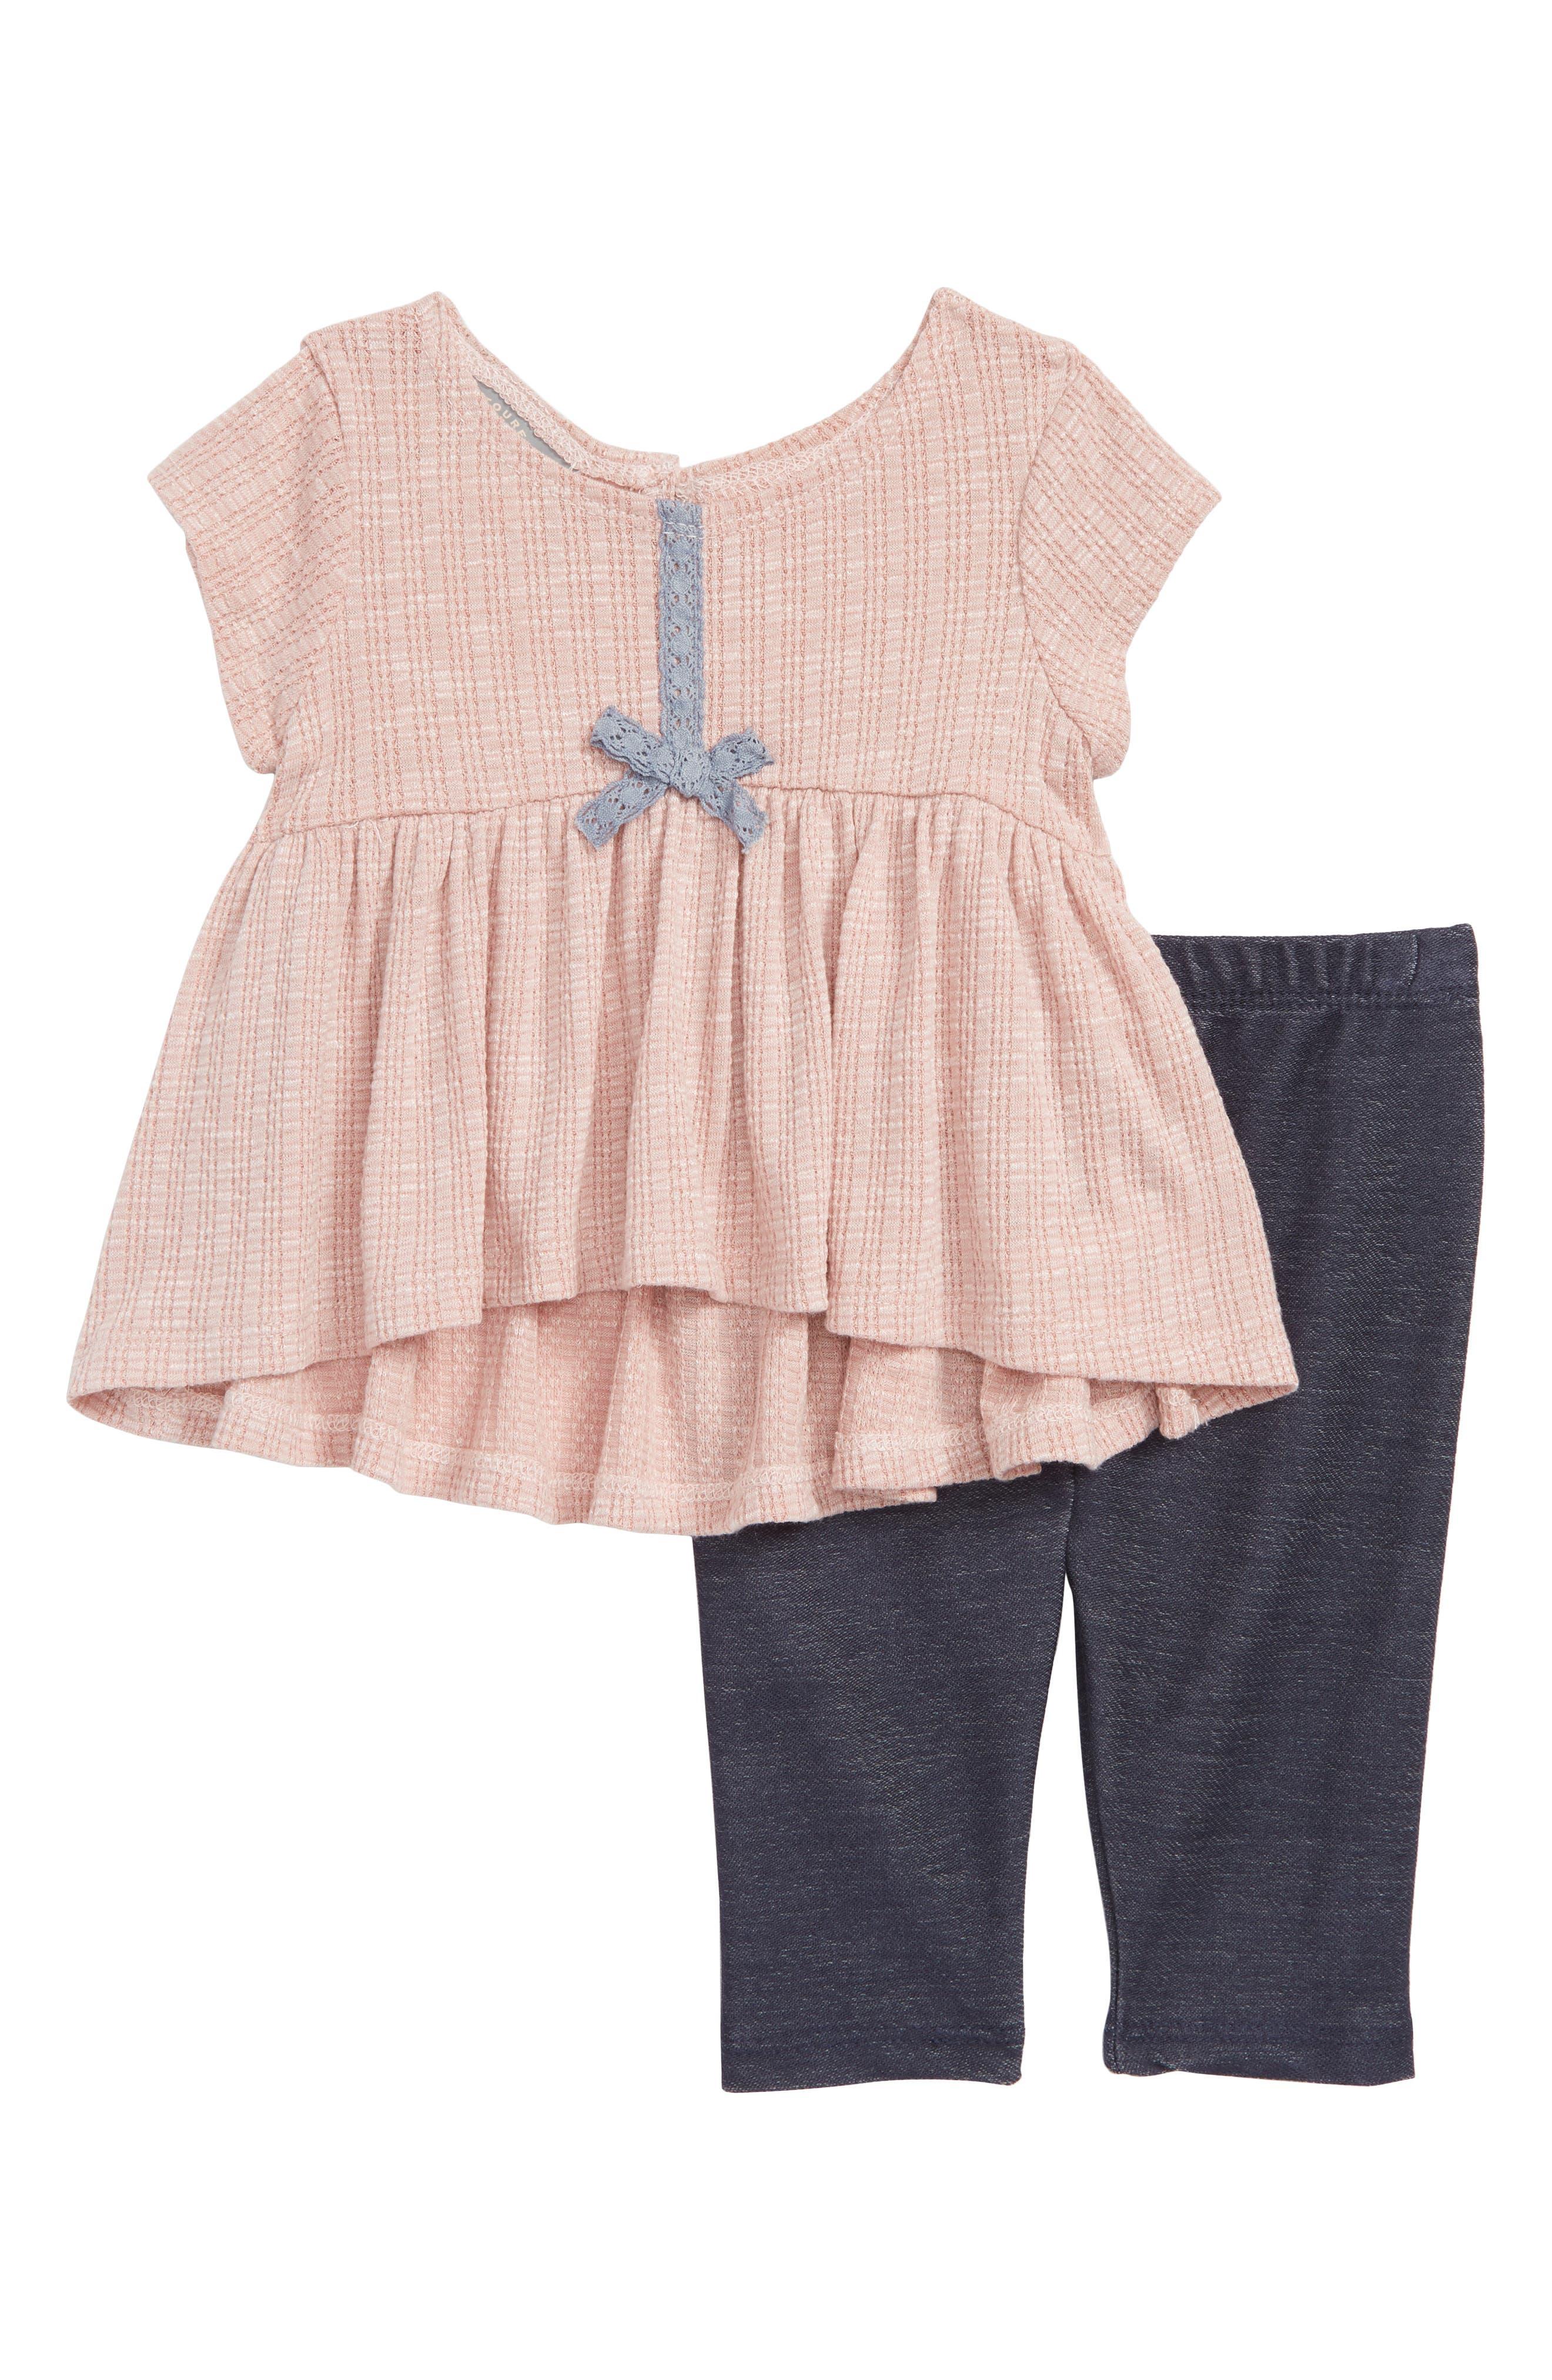 Cap Sleeve High/Low Dress & Leggings Set,                             Main thumbnail 1, color,                             689